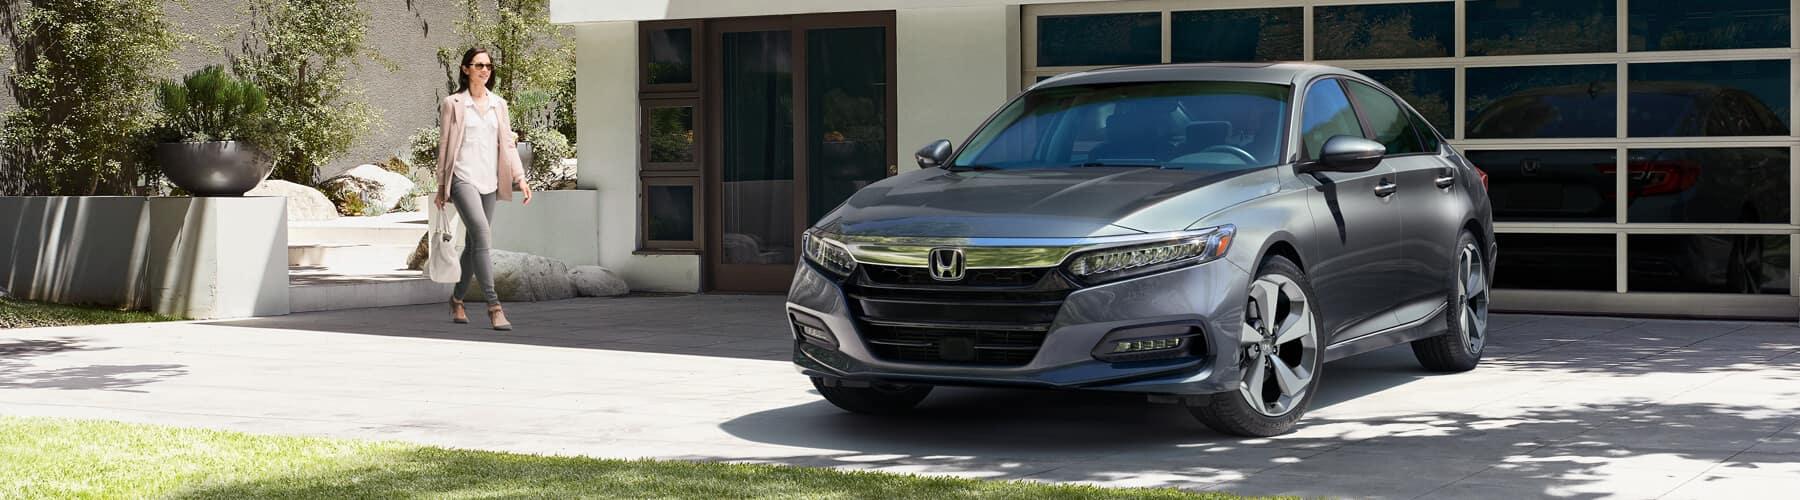 2019 Honda Accord Sedan Slider